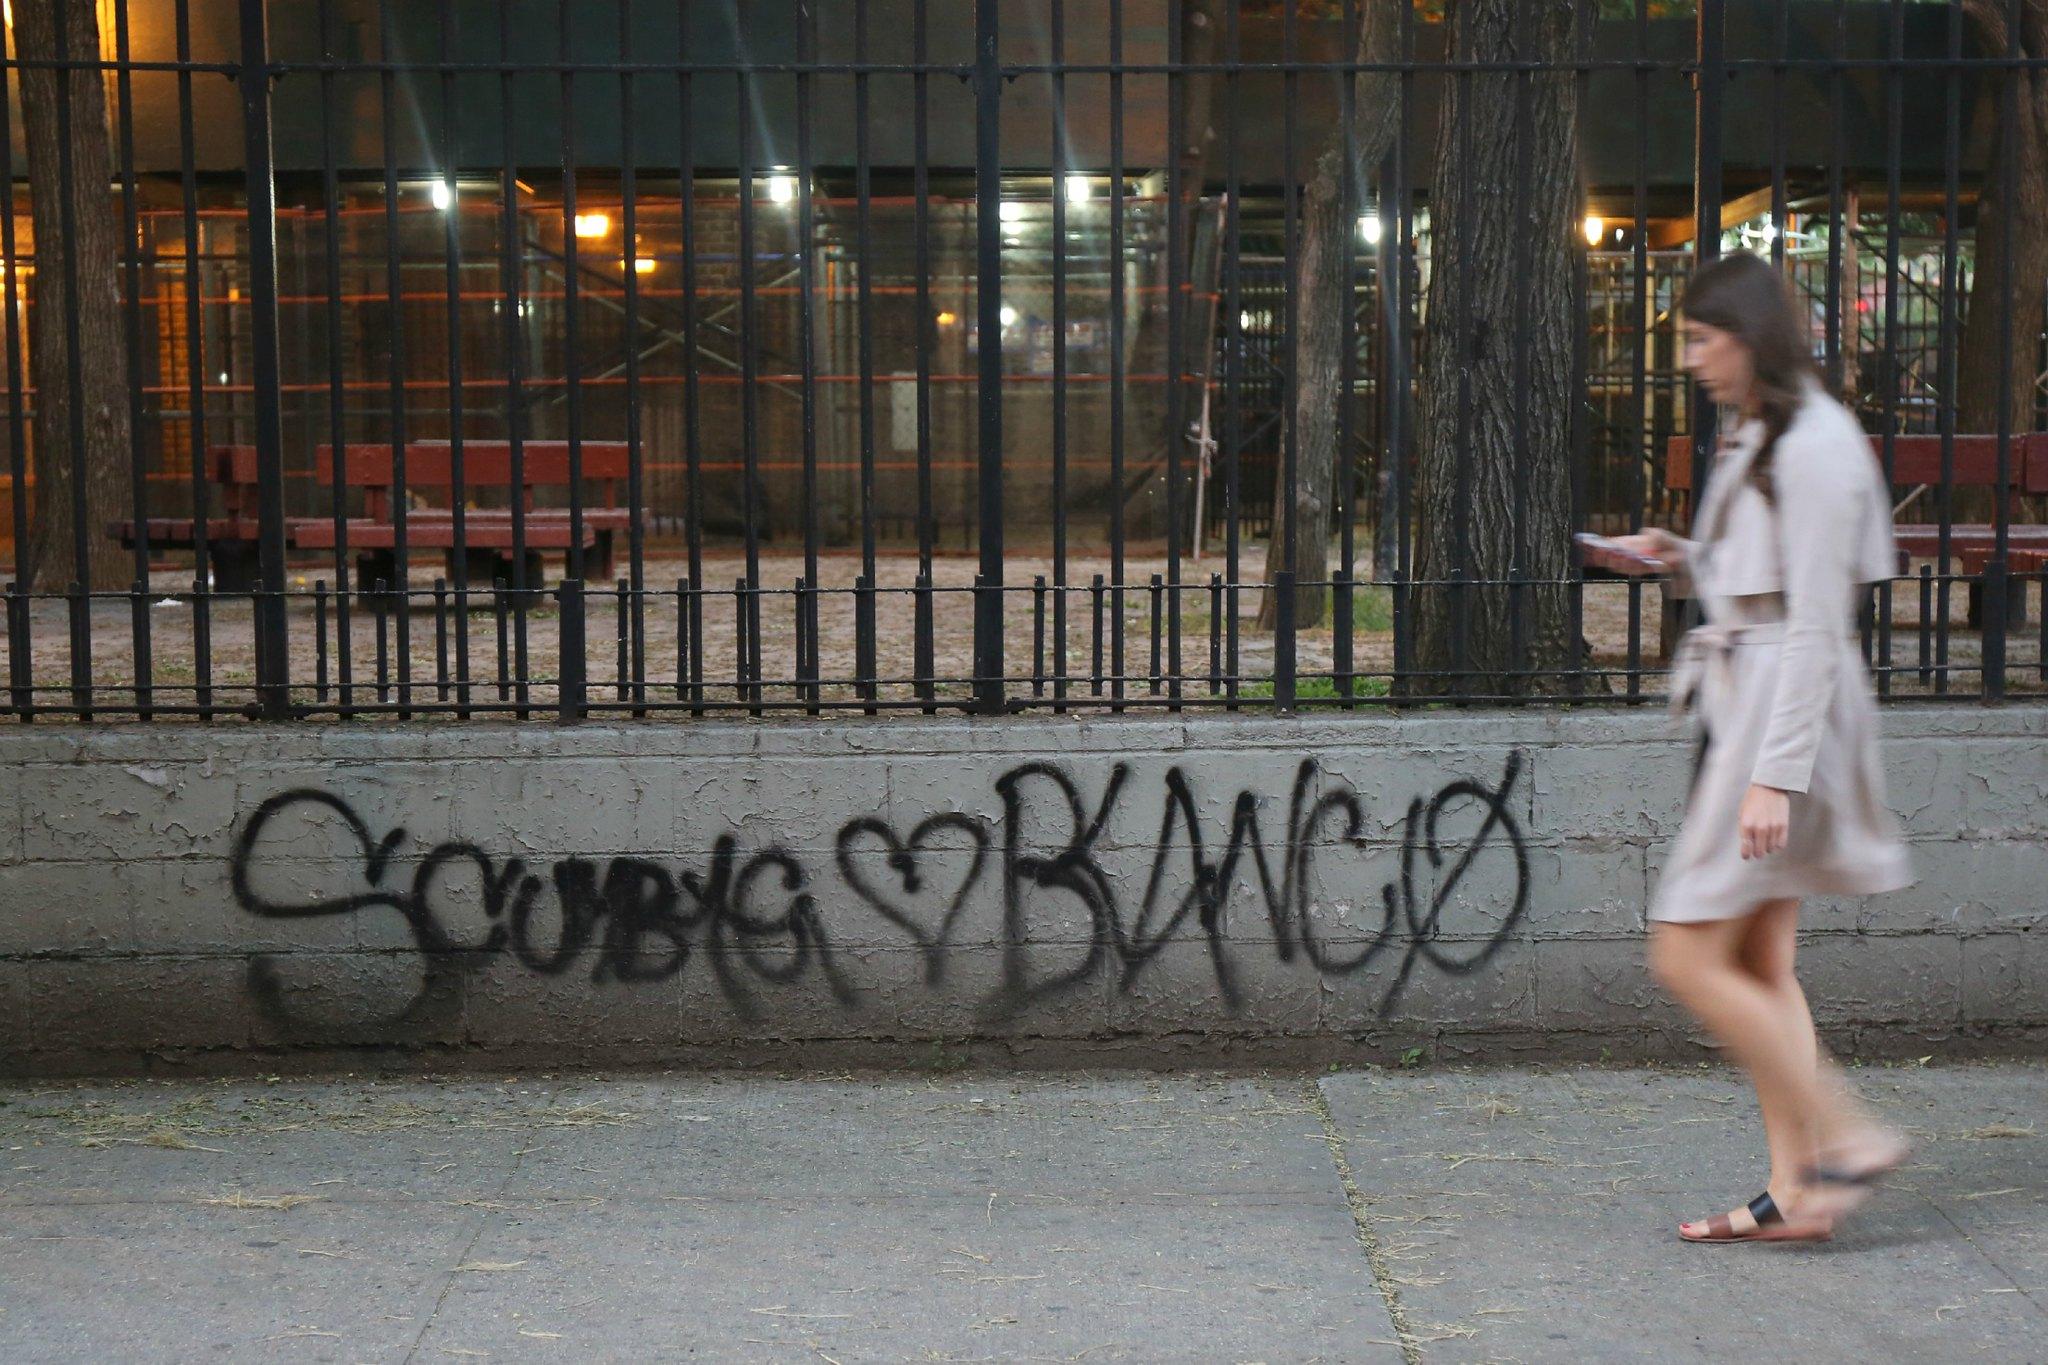 Scumbag loves Blanco